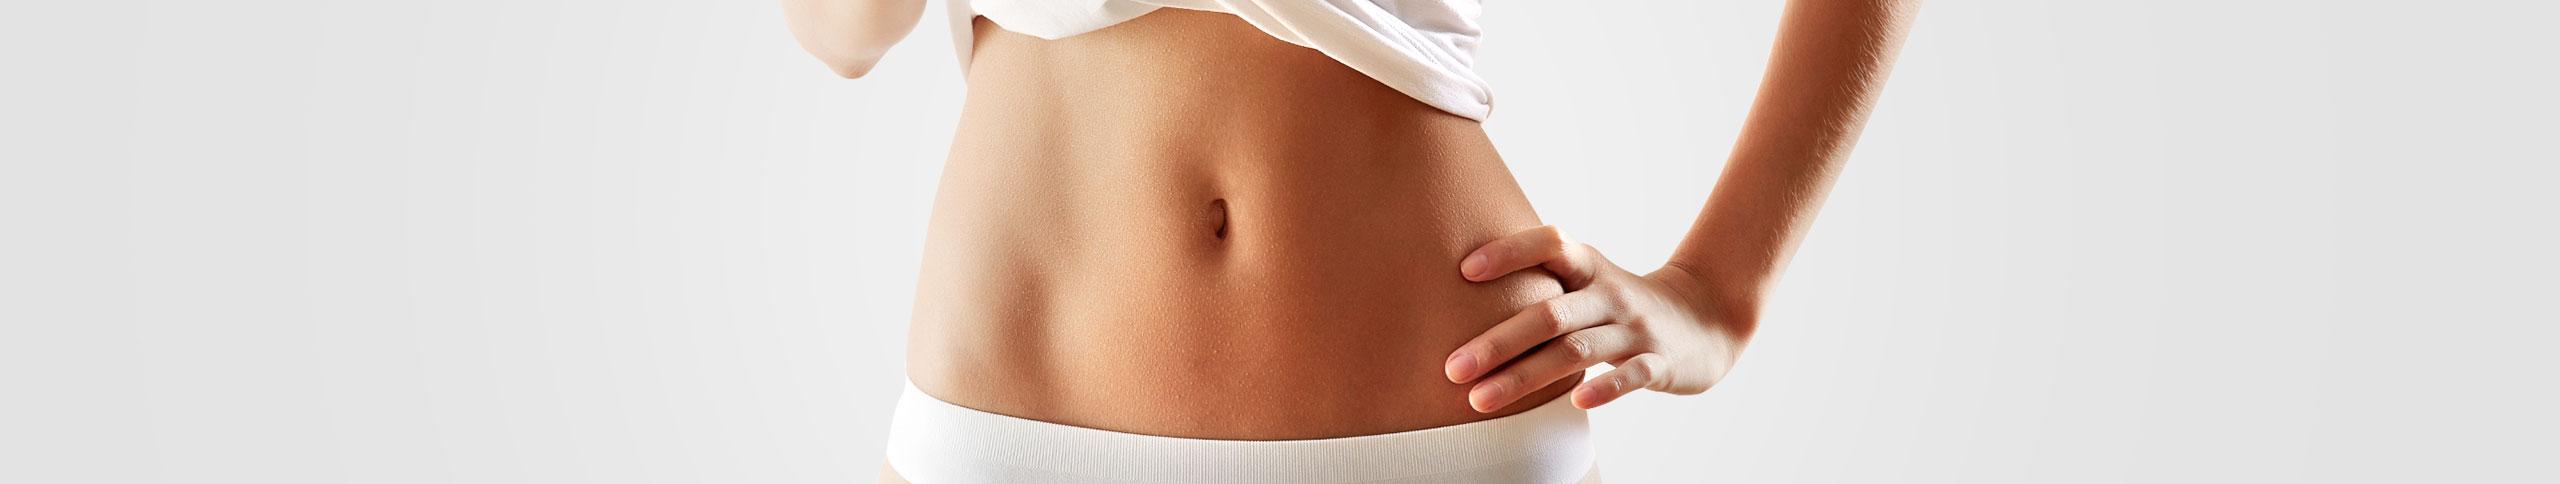 body-treatments-sydney-beauty-and-cosmetic-clinic-cbd